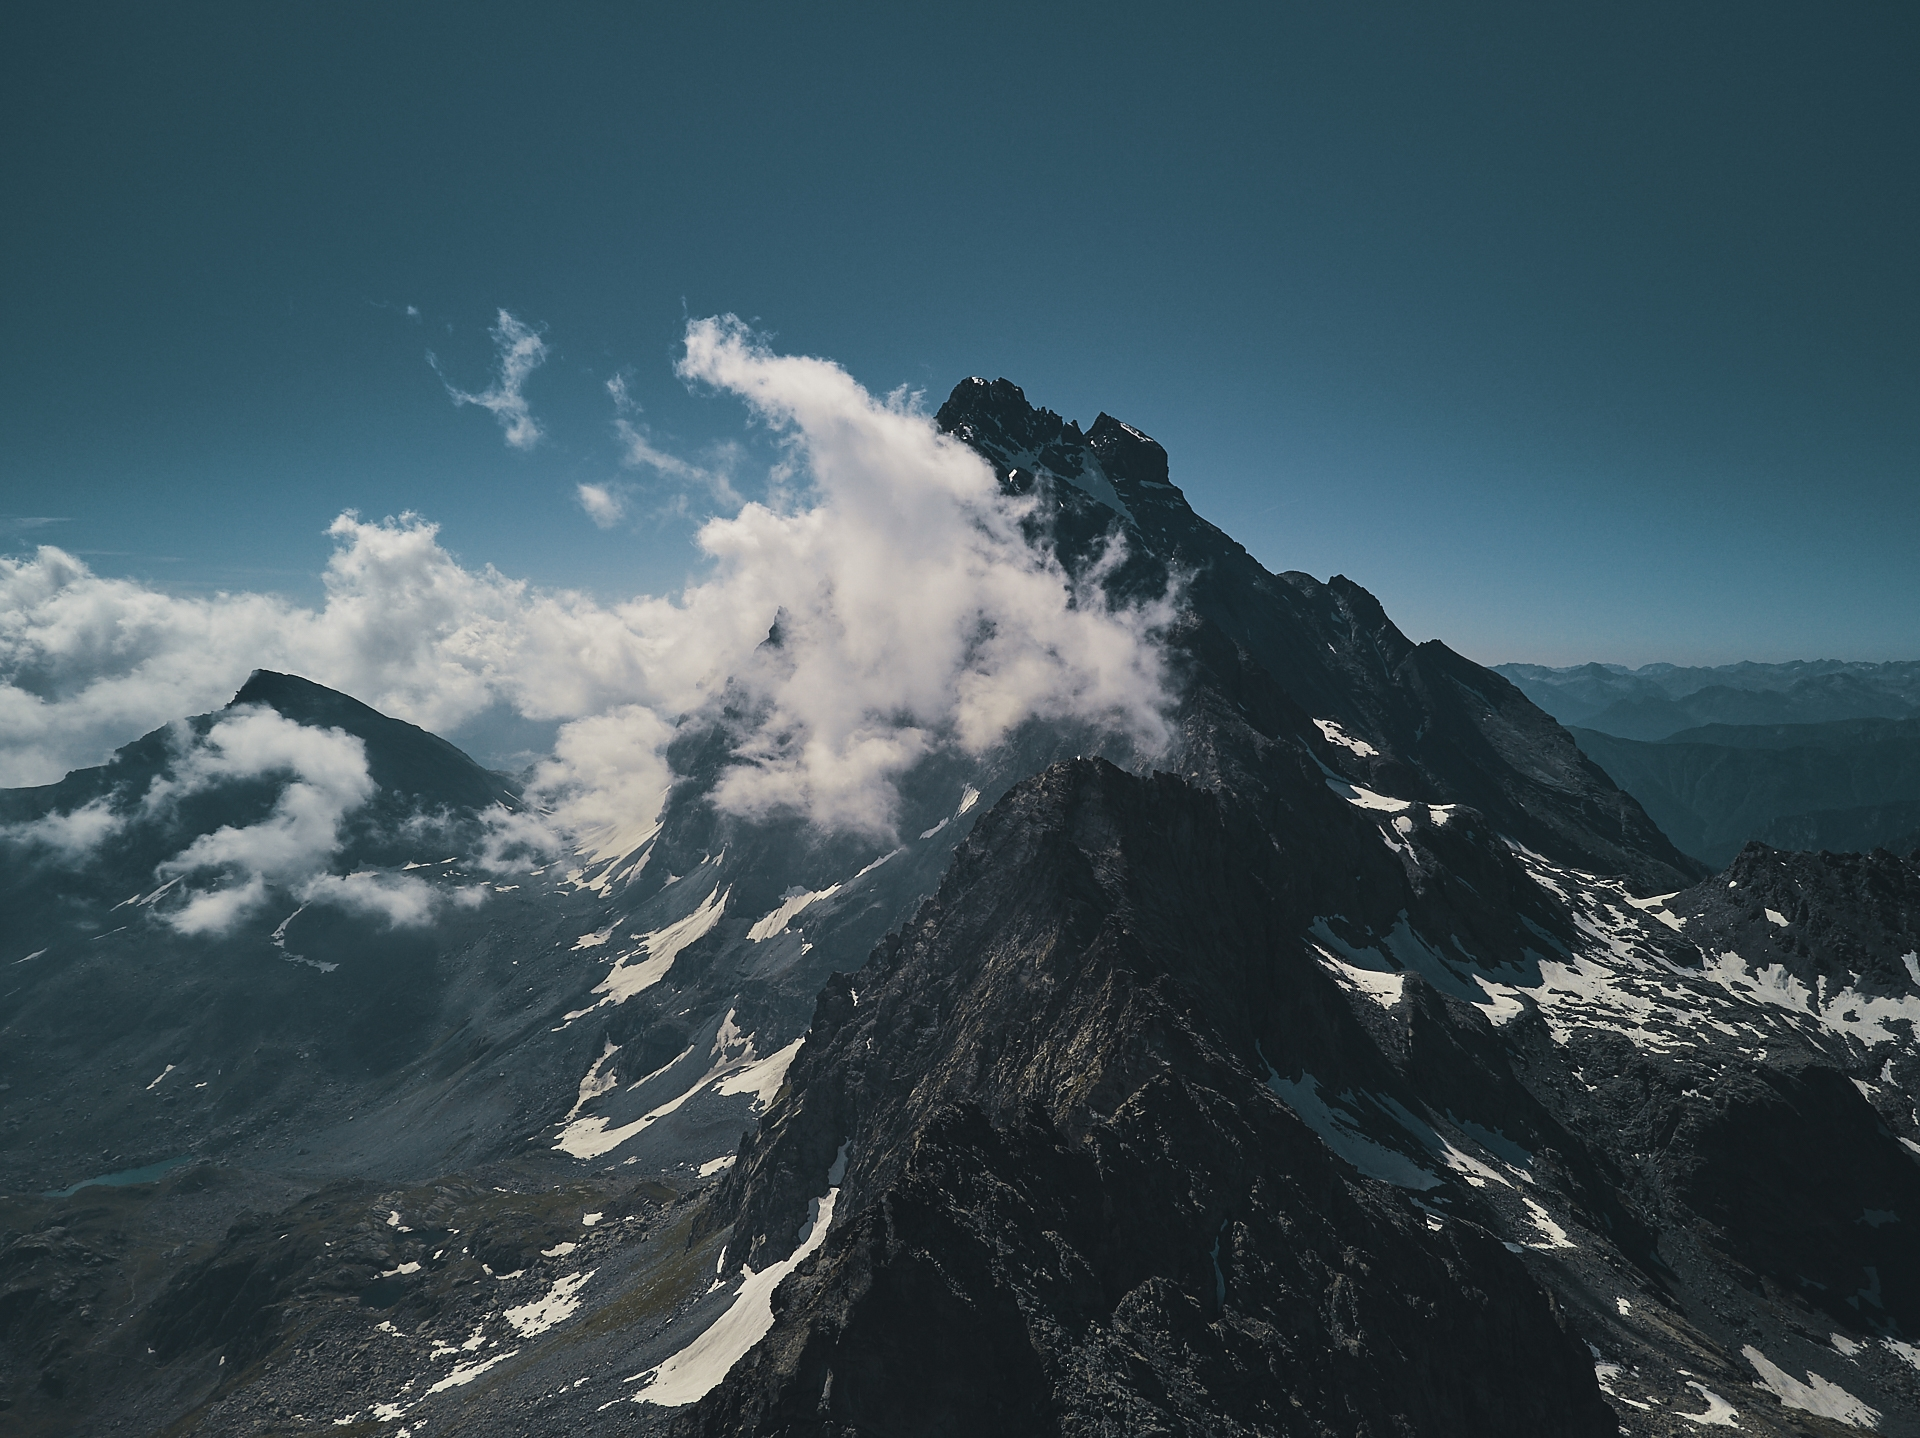 Mount Viso, Italy